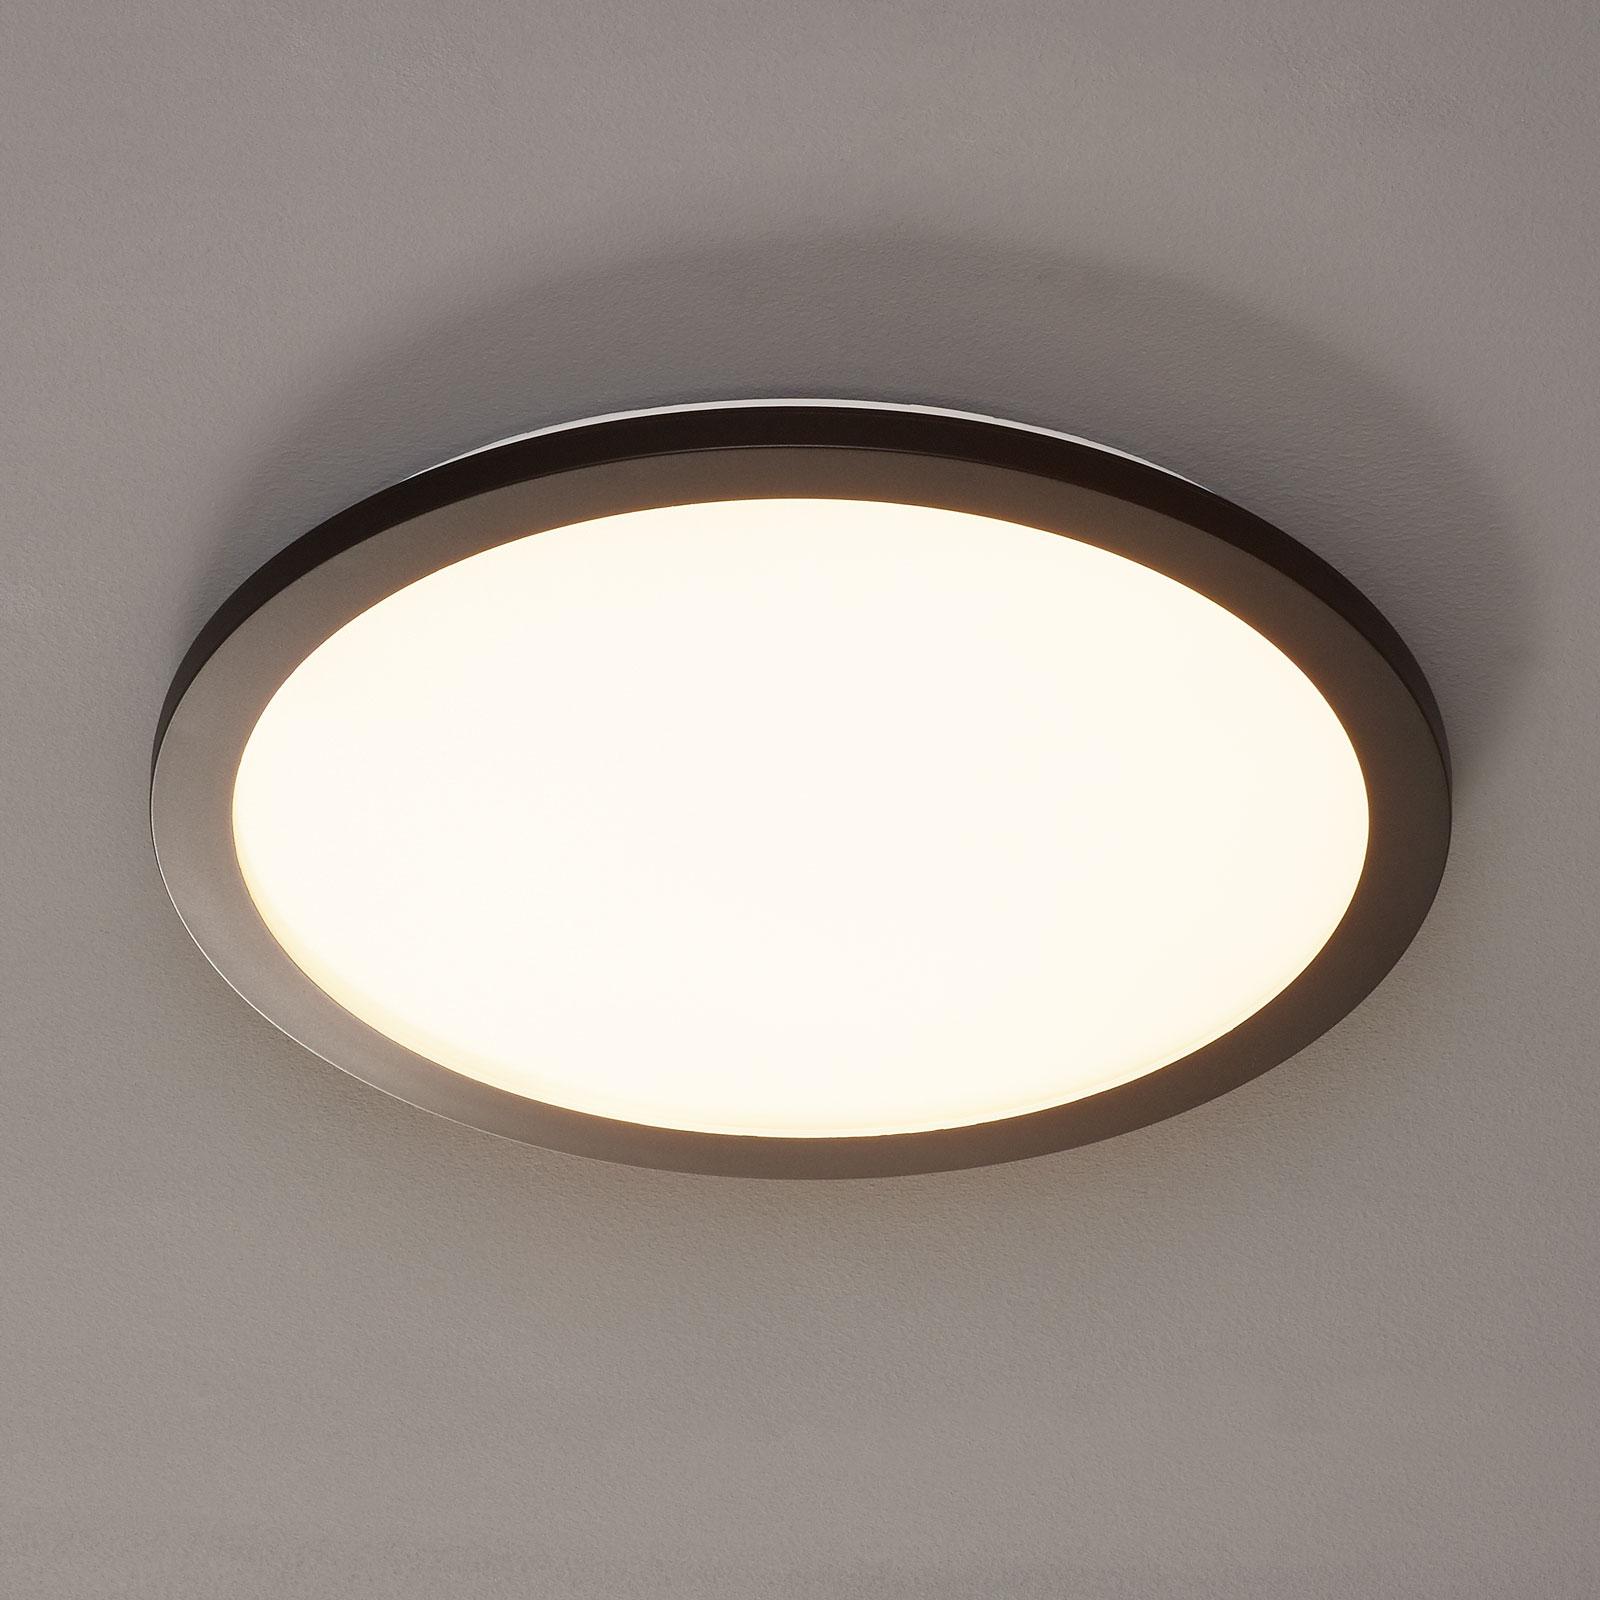 Lampa sufitowa LED Camillus, okrągła, Ø 40 cm